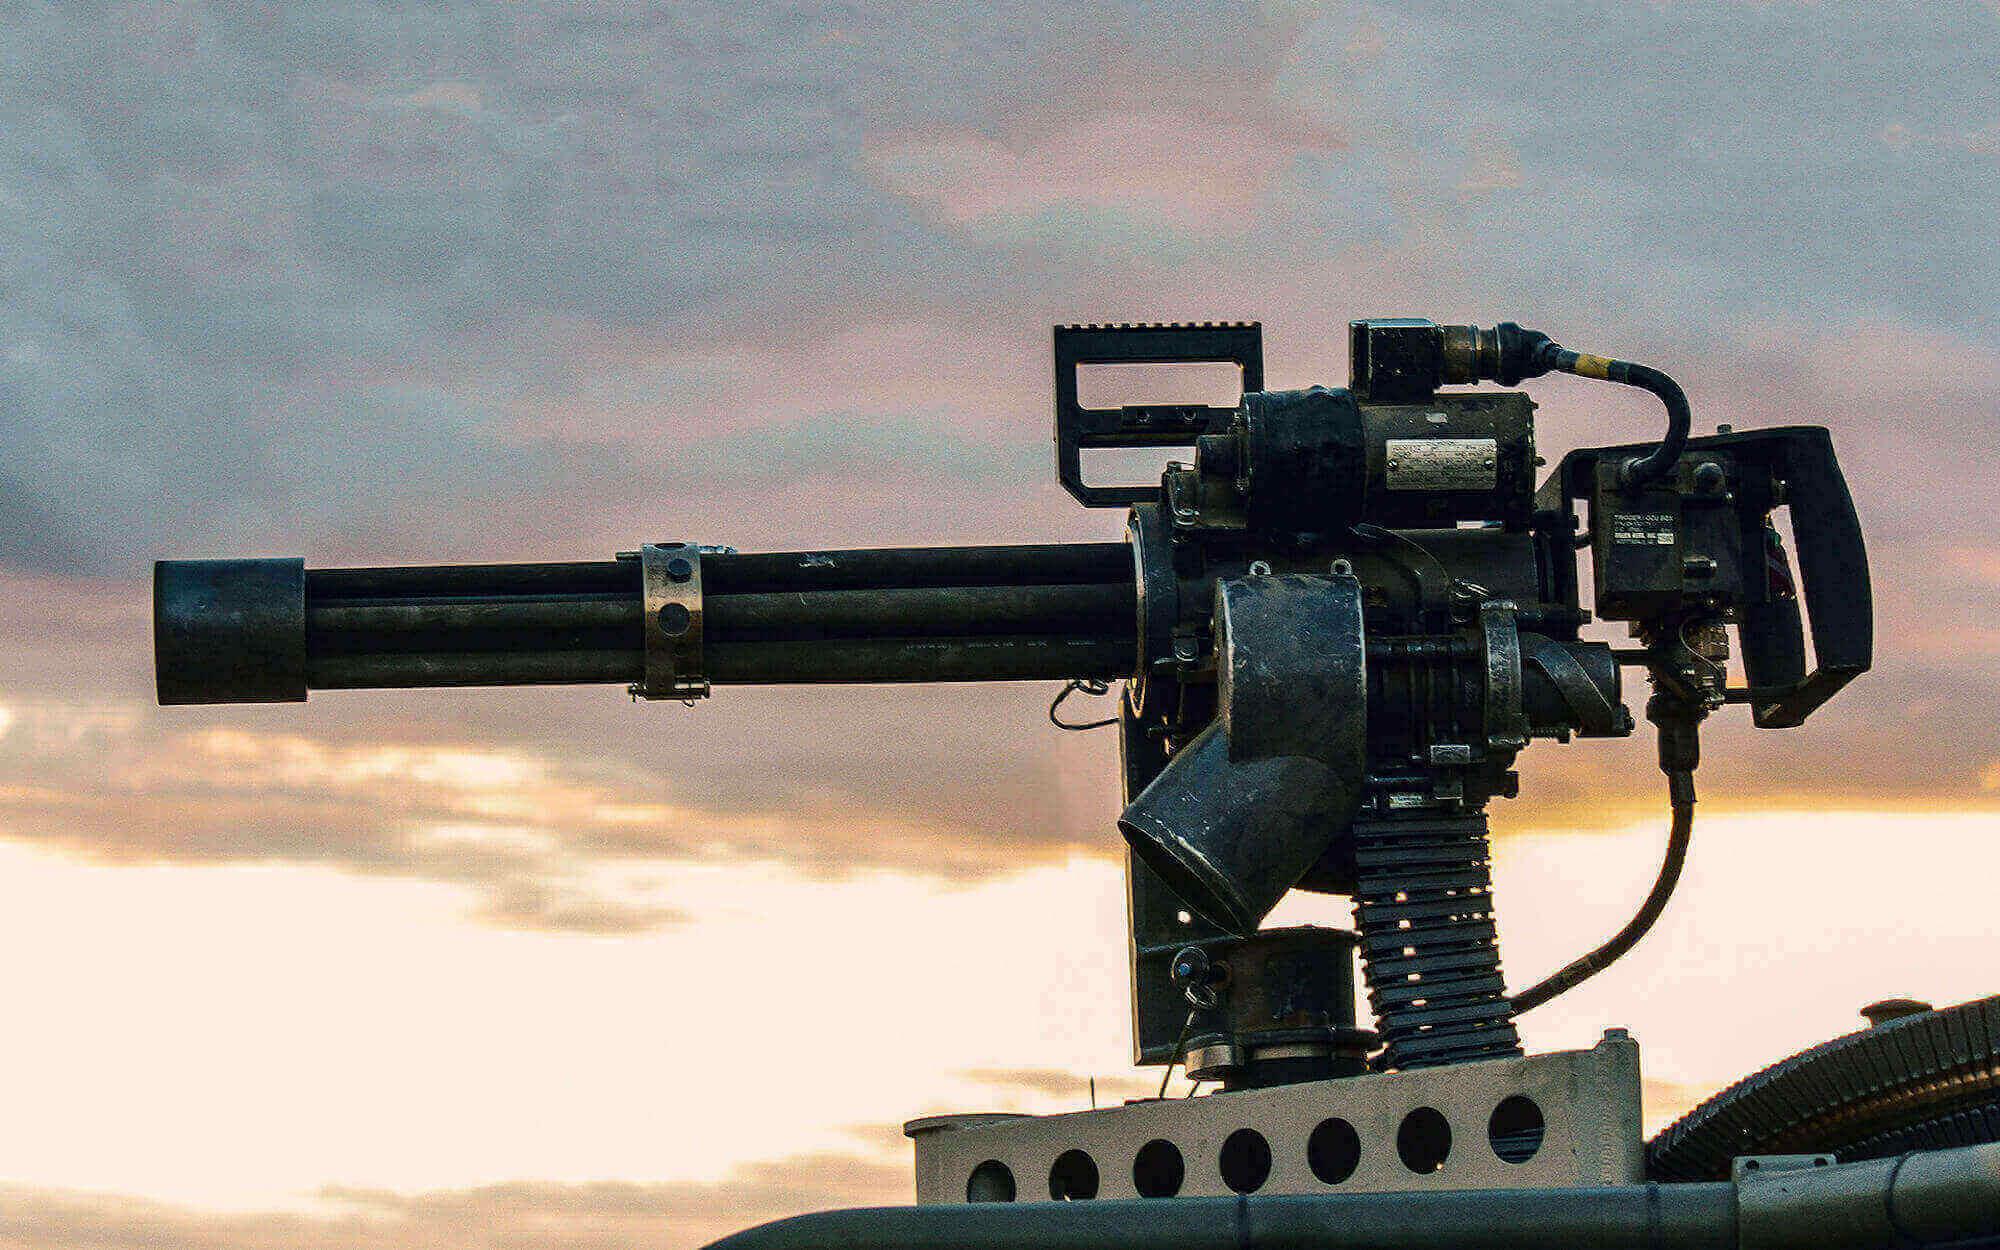 dillon aero m134 minigun